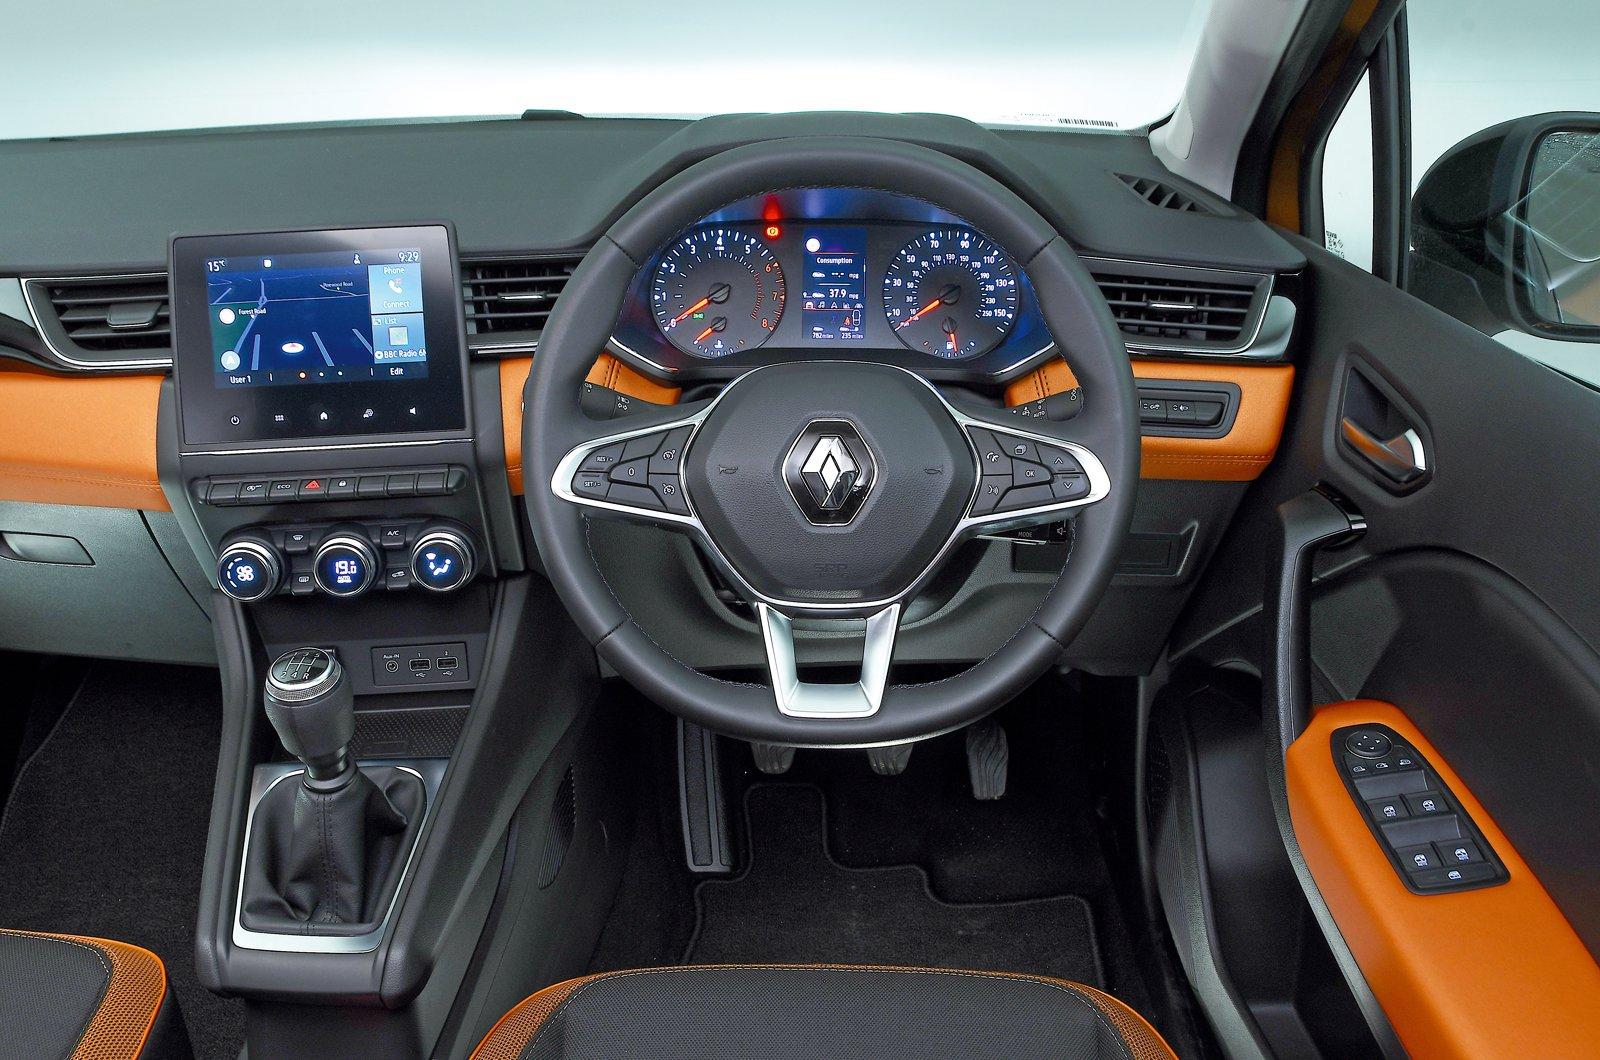 Renault Captur dashboard - orange 69-plate car